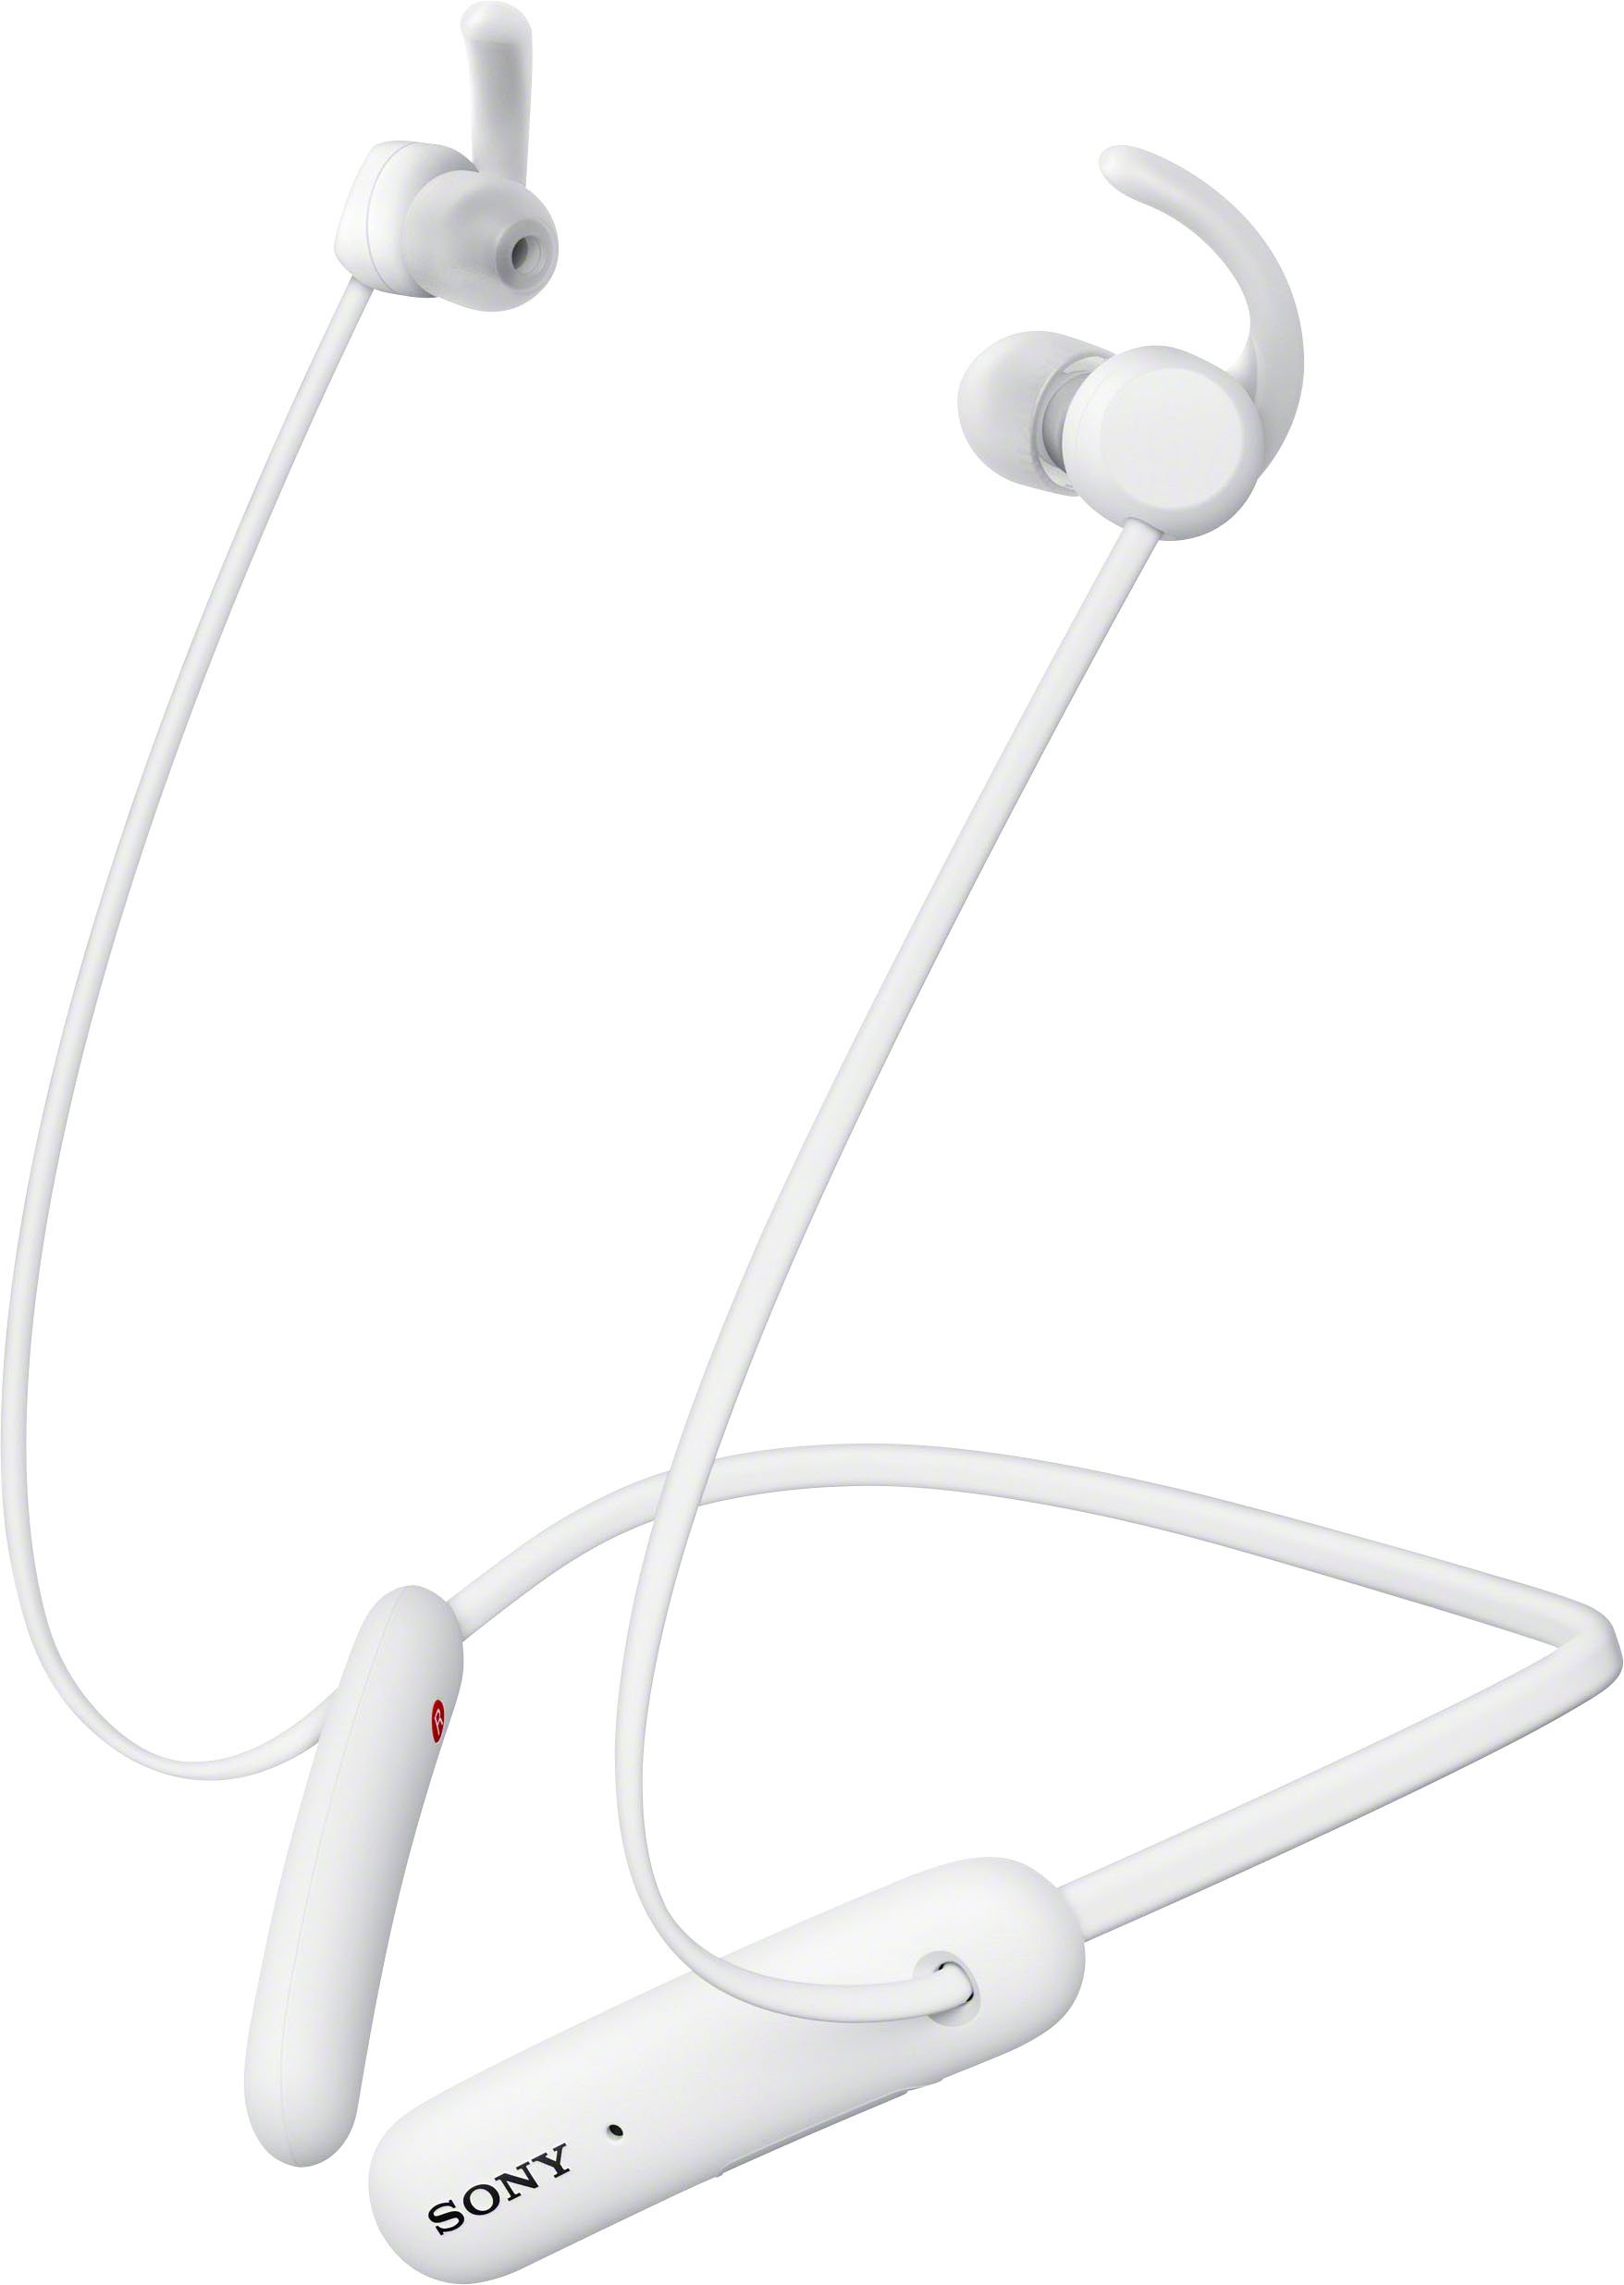 Sony in-ear-hoofdtelefoon WI-SP510 draadloos Headset met microfoon veilig op otto.nl kopen